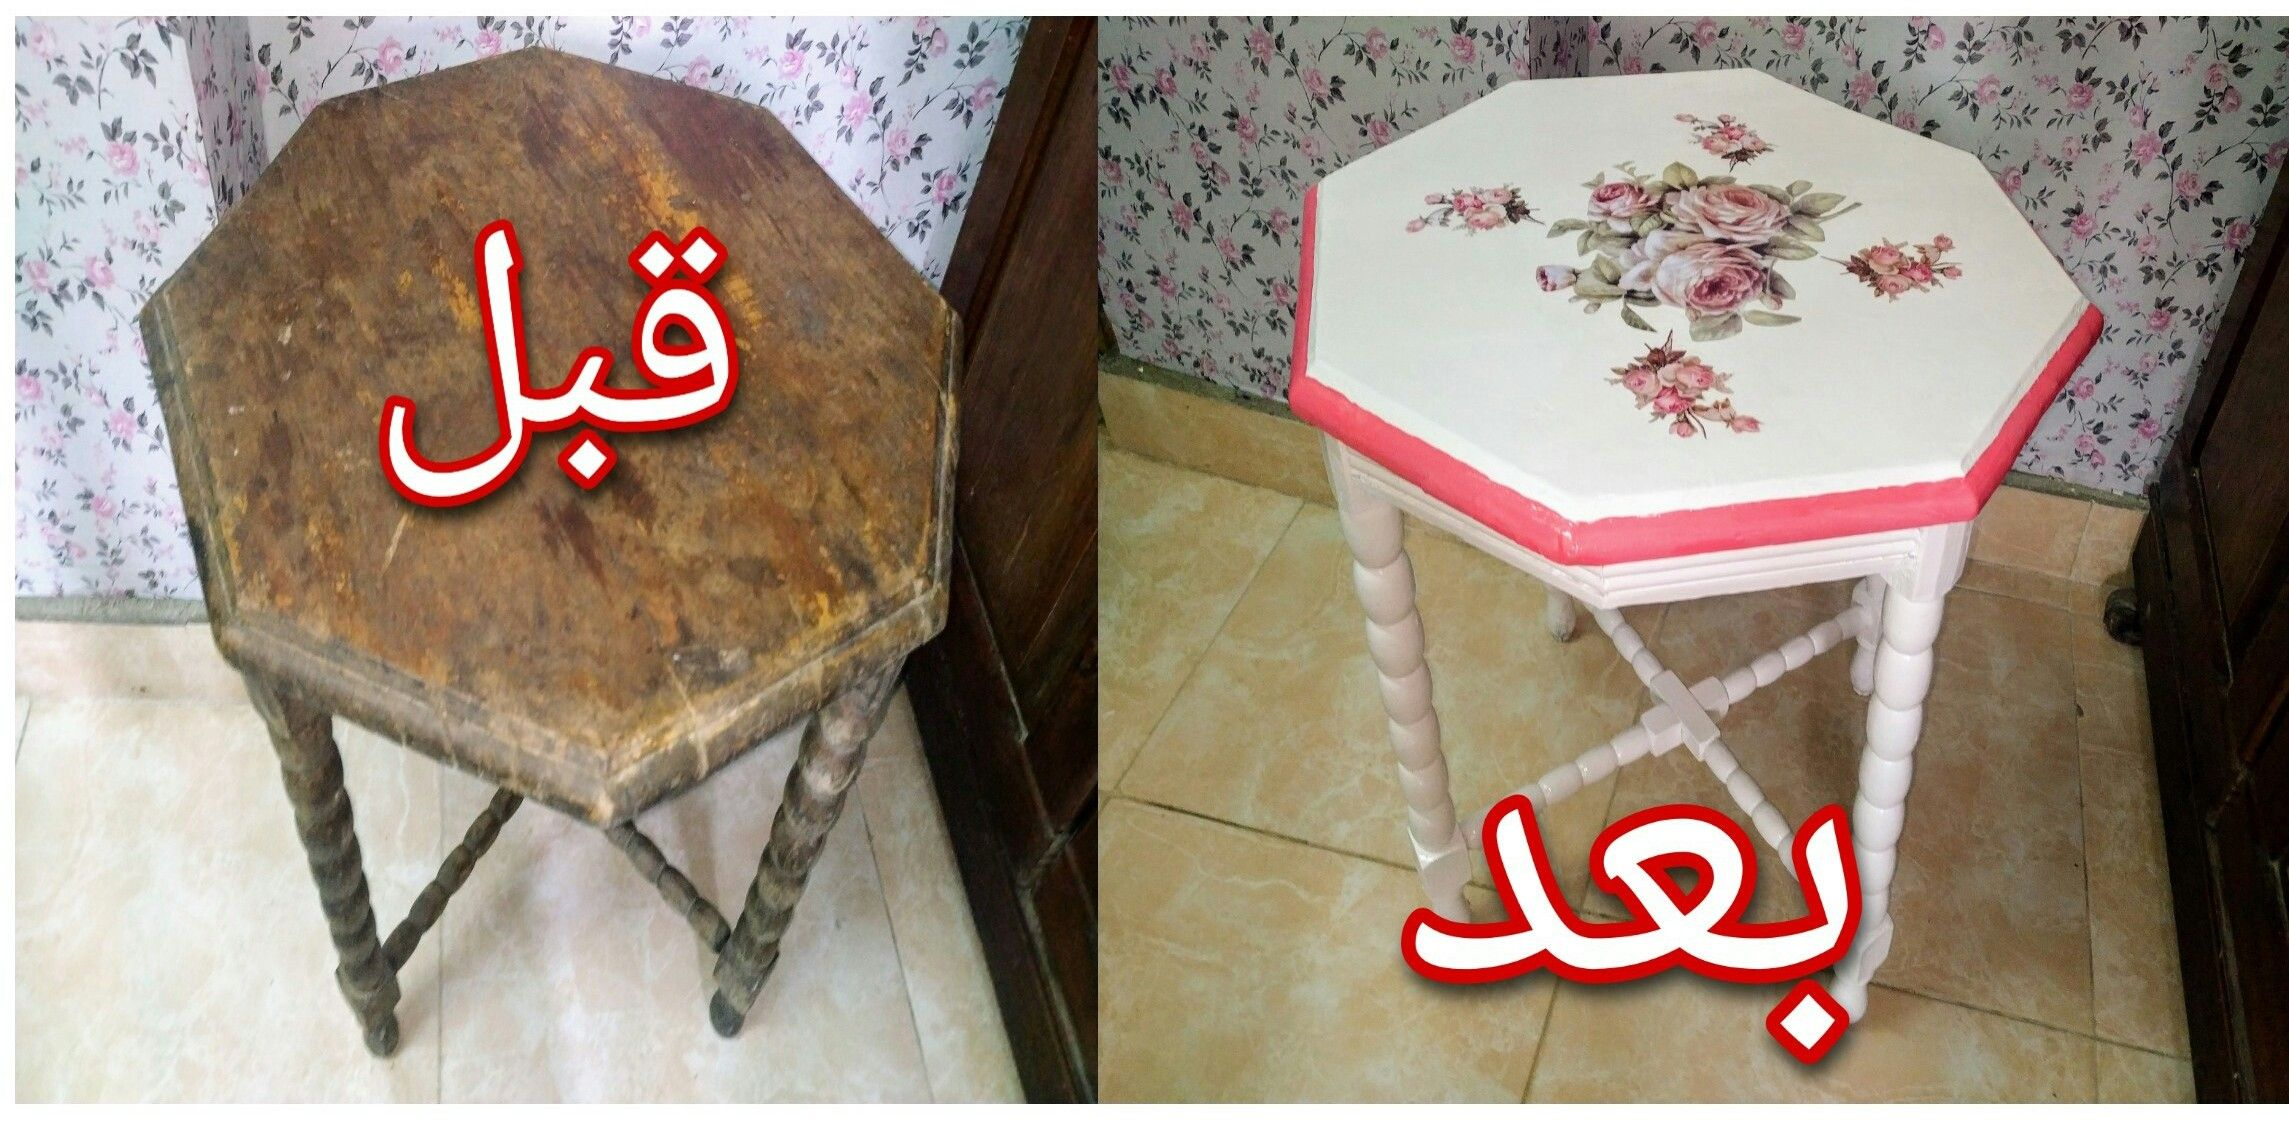 عملت تجديد لترابيزه قديمه عمرها ٣٠ سنه Decor Home Decor Furniture